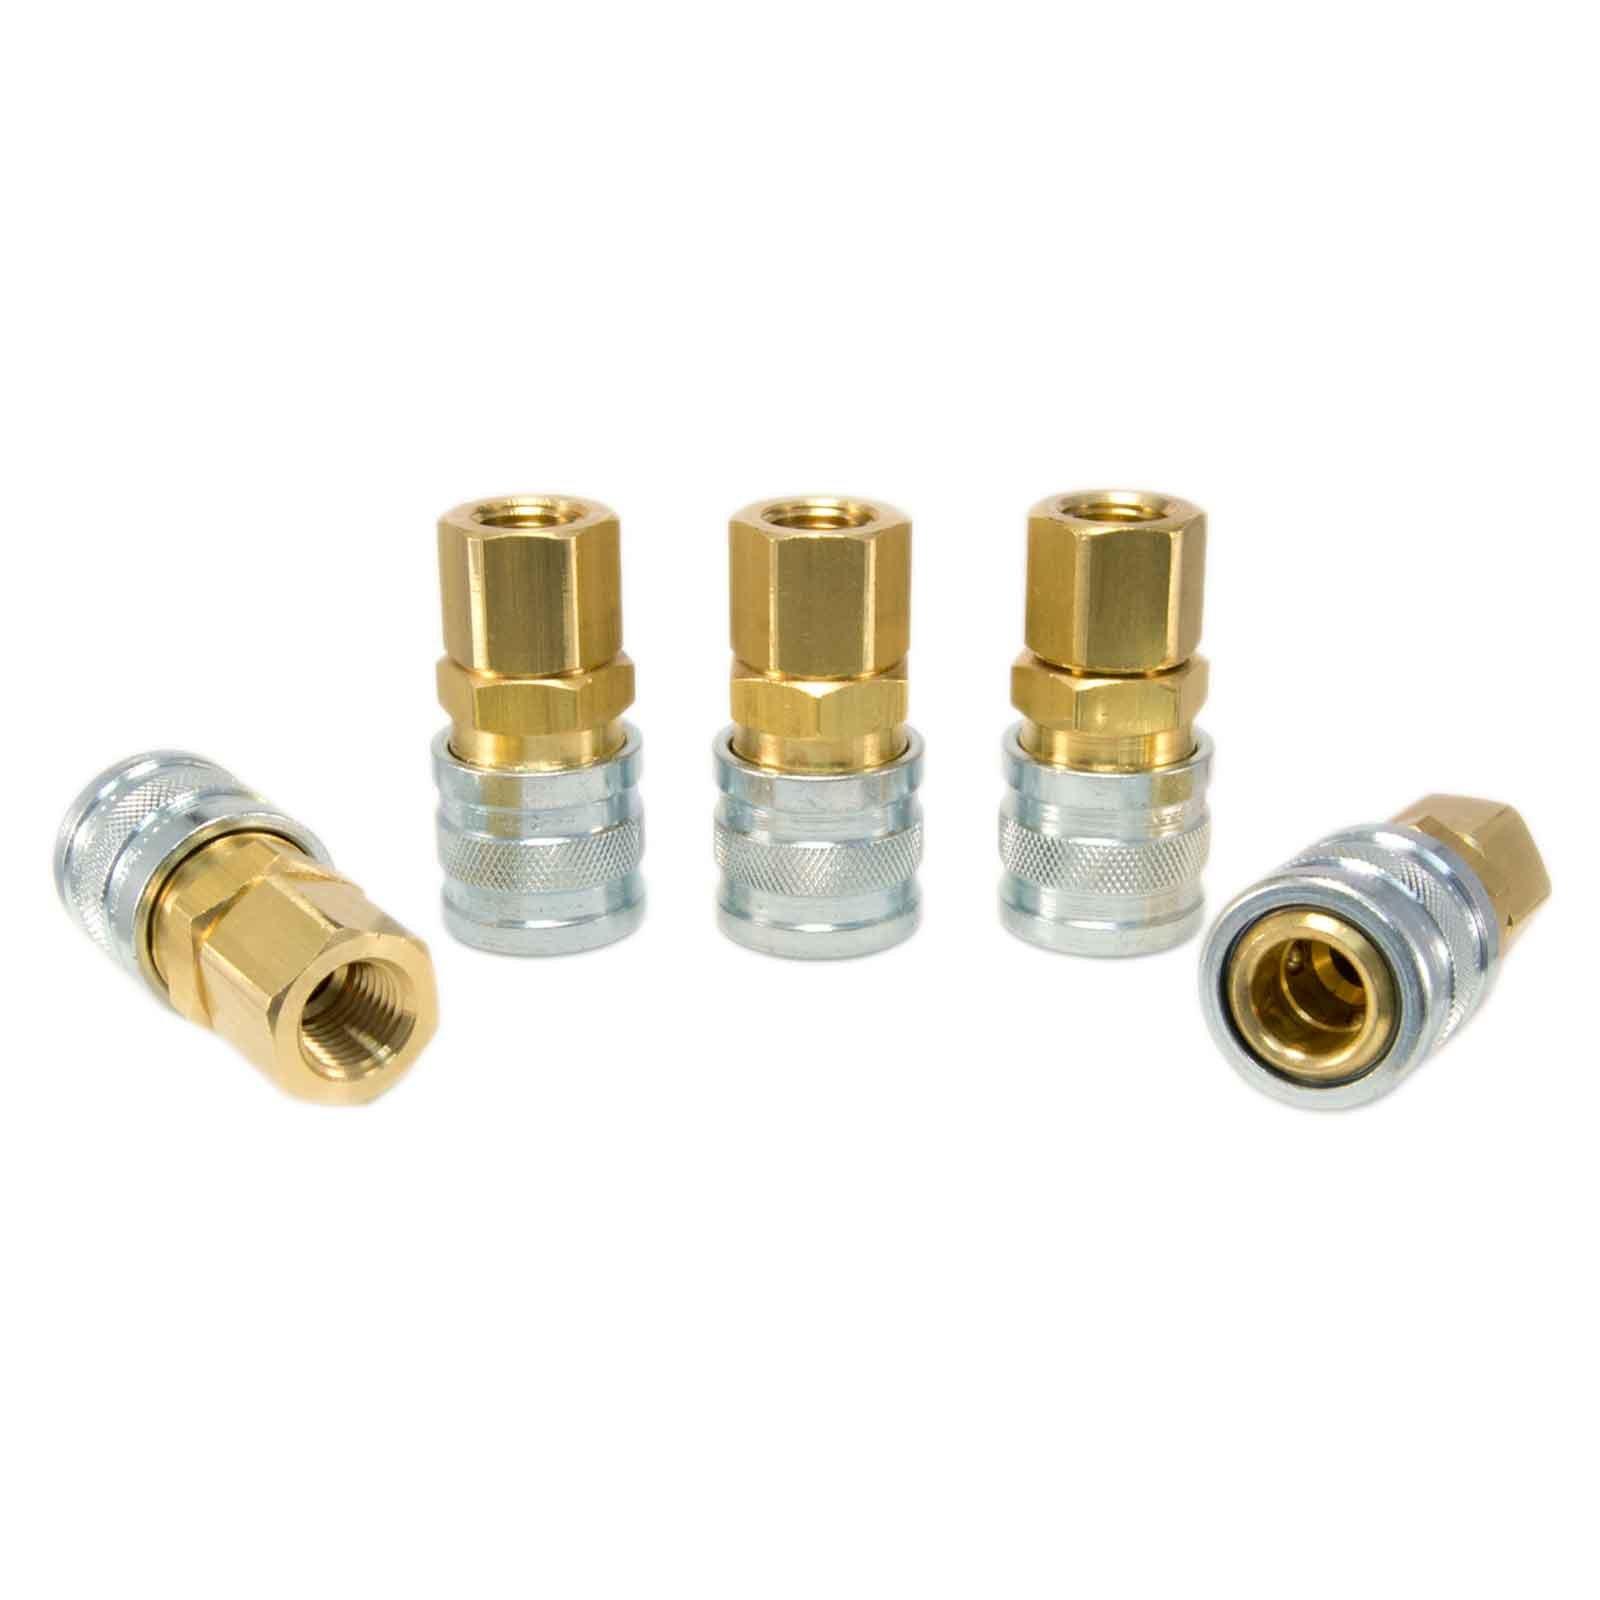 Foster 3 Series - Couplers 5pc, 1/4'' Body, 1/4'' NPT - Industrial Interchange, I/M, MIL Spec